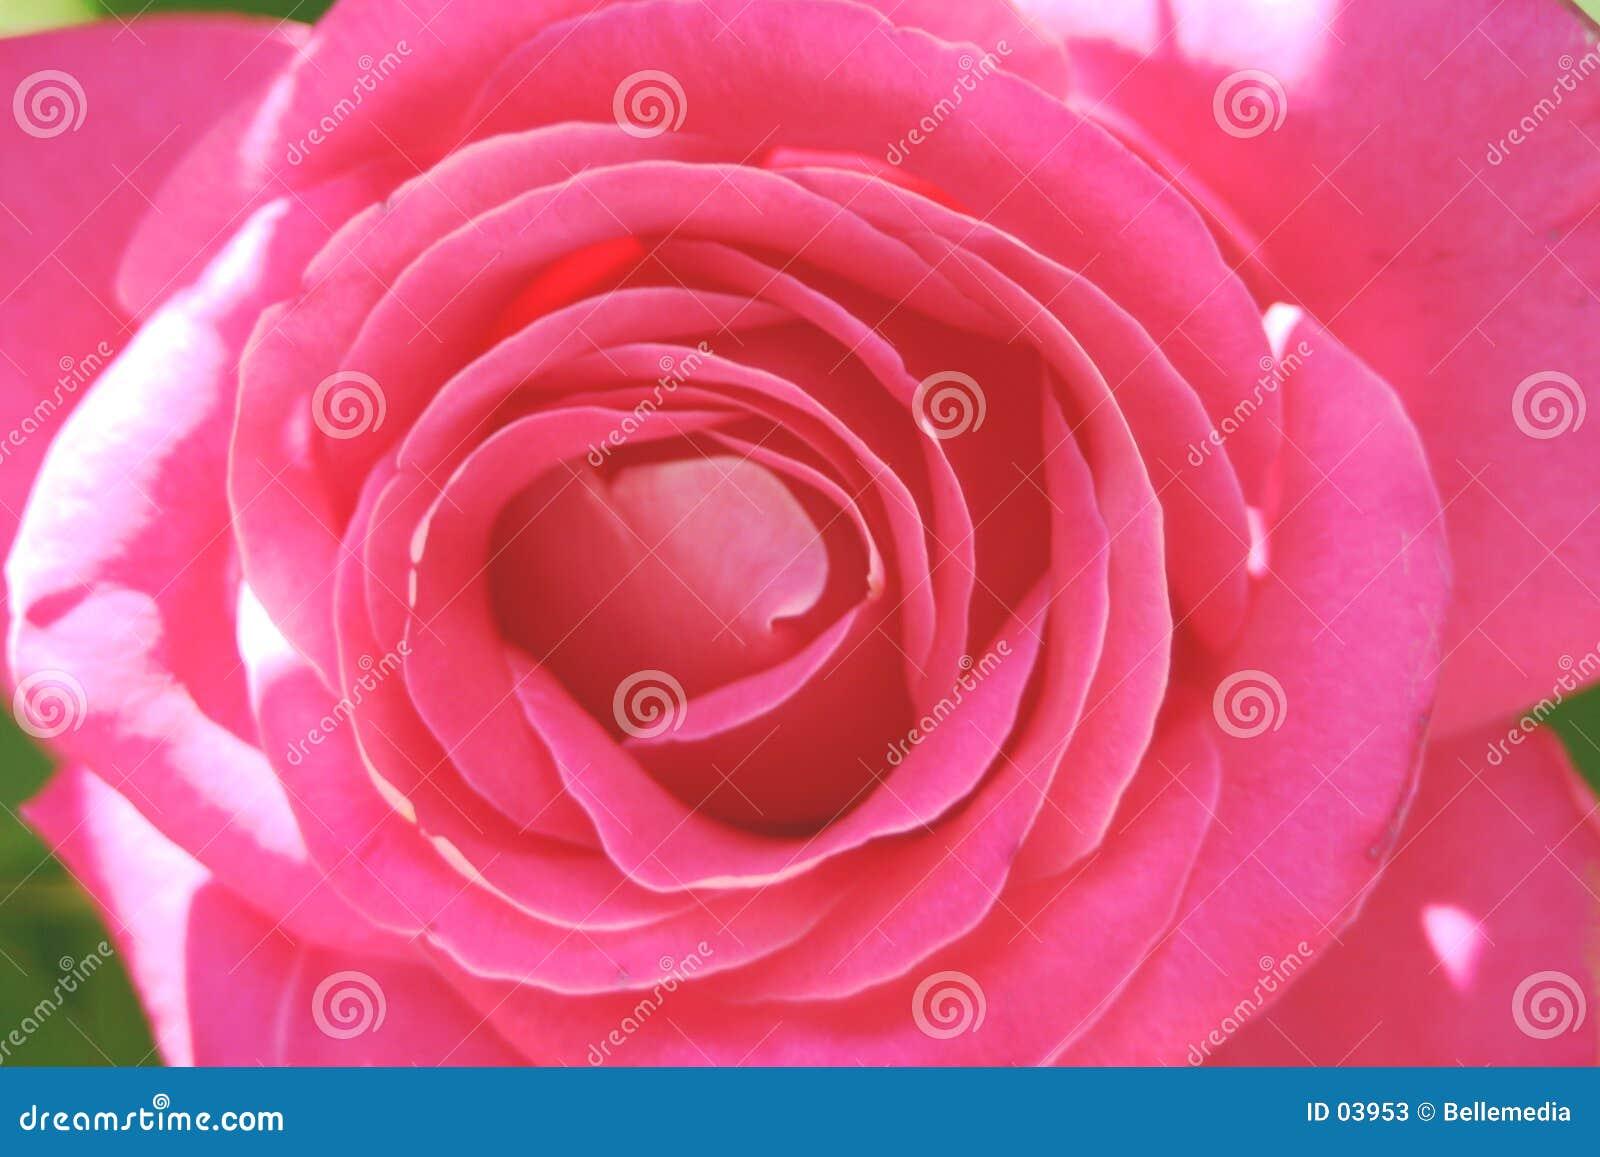 In the petals